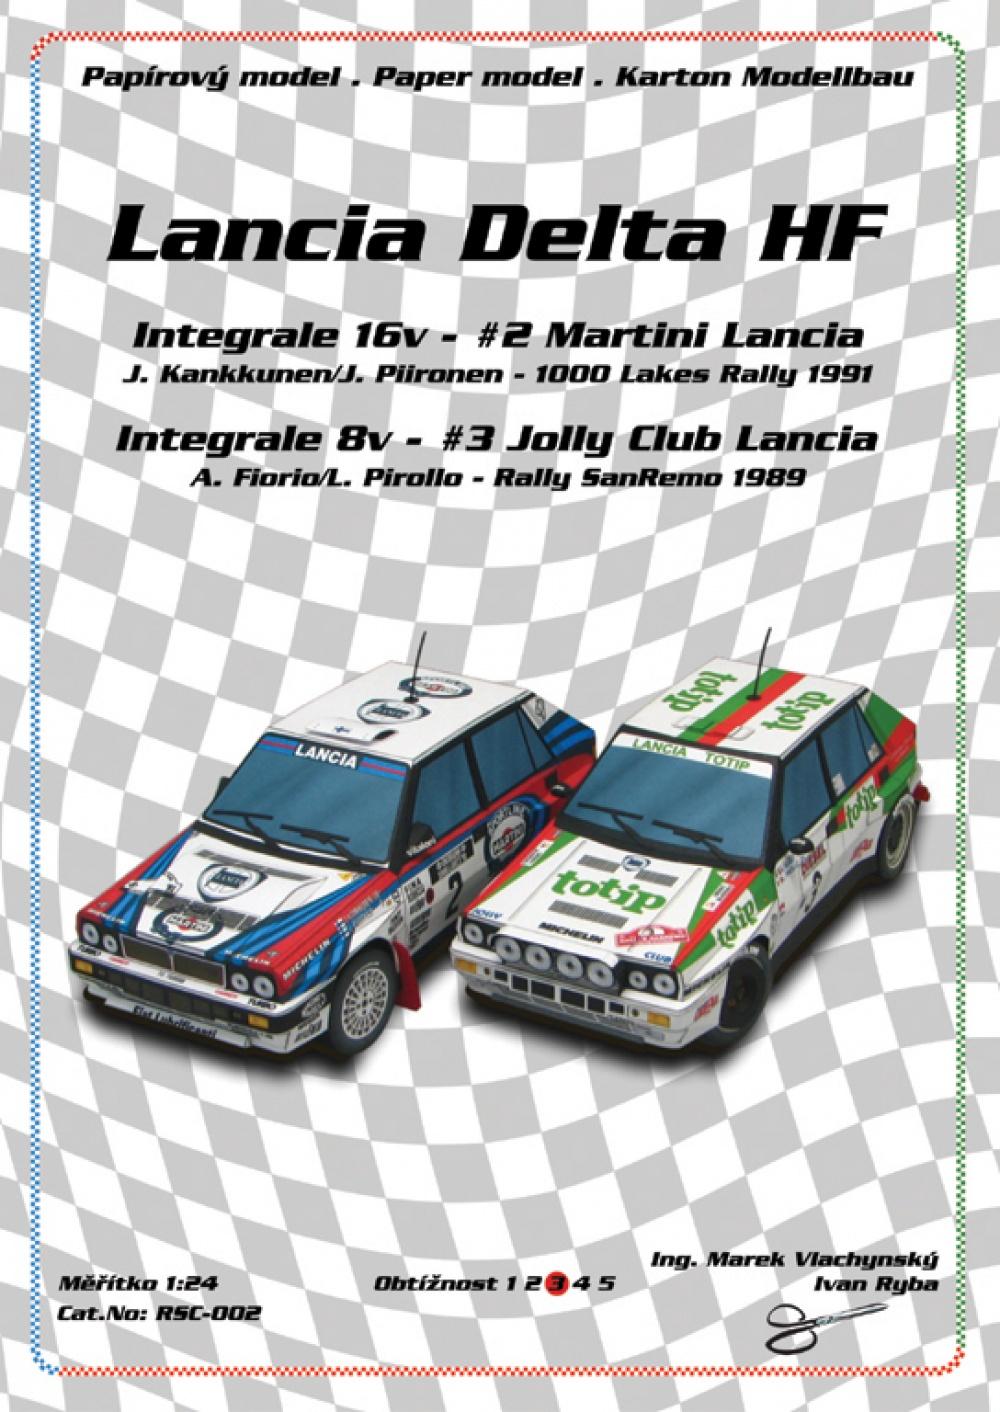 Lancia Delta HF Integrale 8v 1989